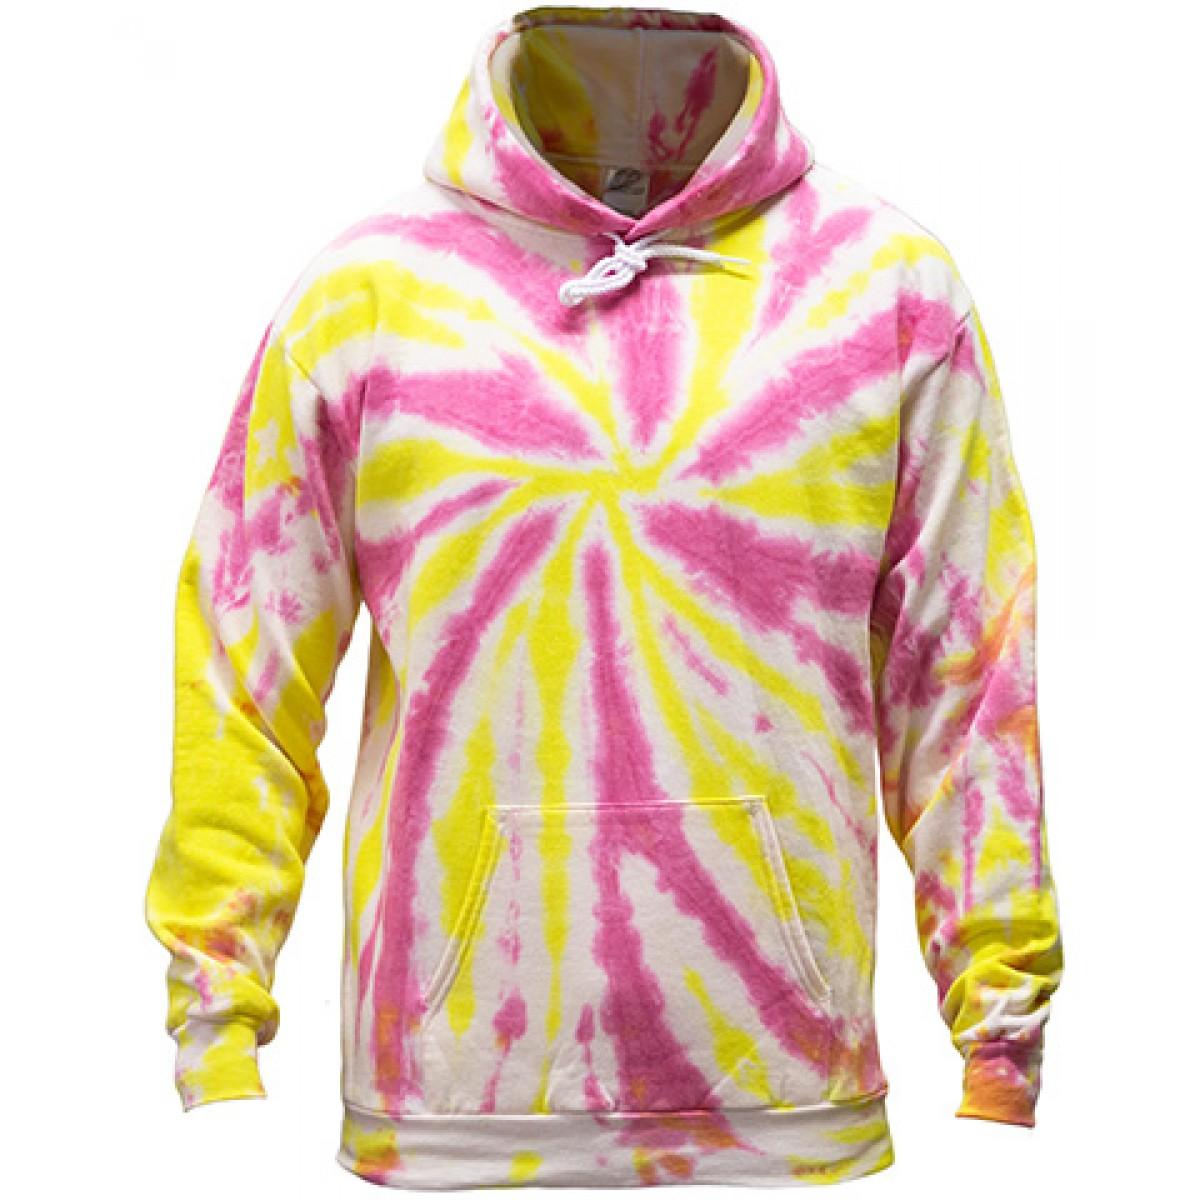 Tie-Dye Pullover Hooded Sweatshirt-Pink/Yellow-L